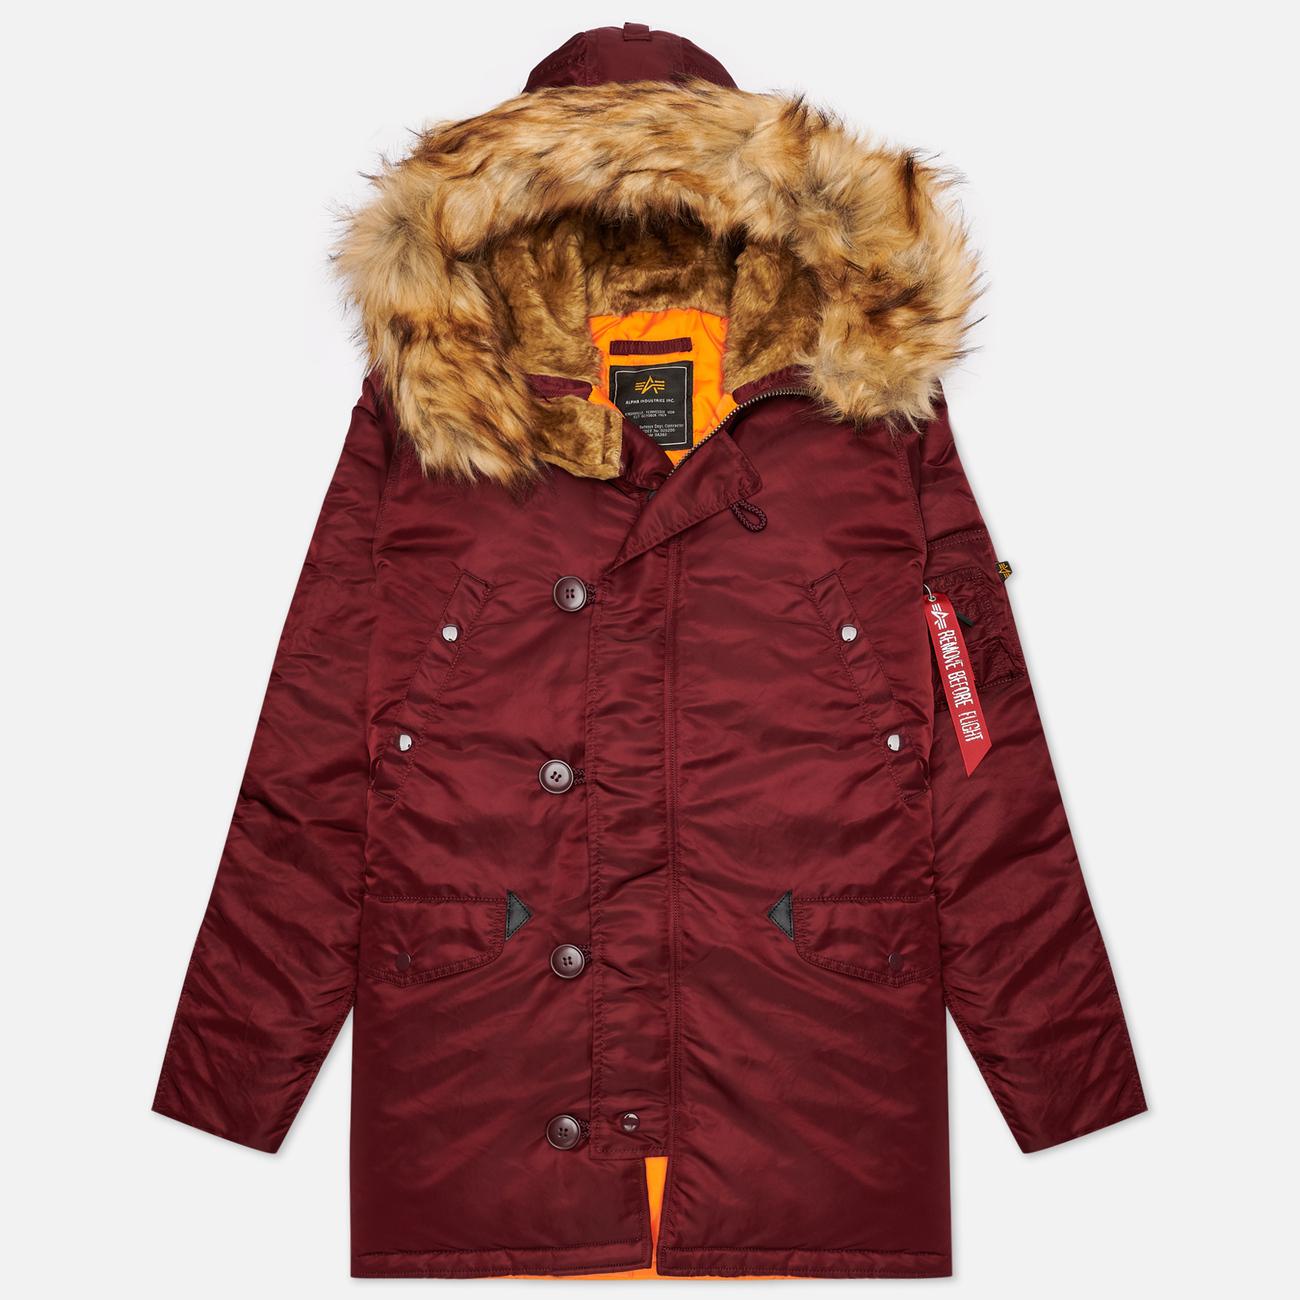 Мужская куртка парка Alpha Industries N3B VF 59 Wine Red